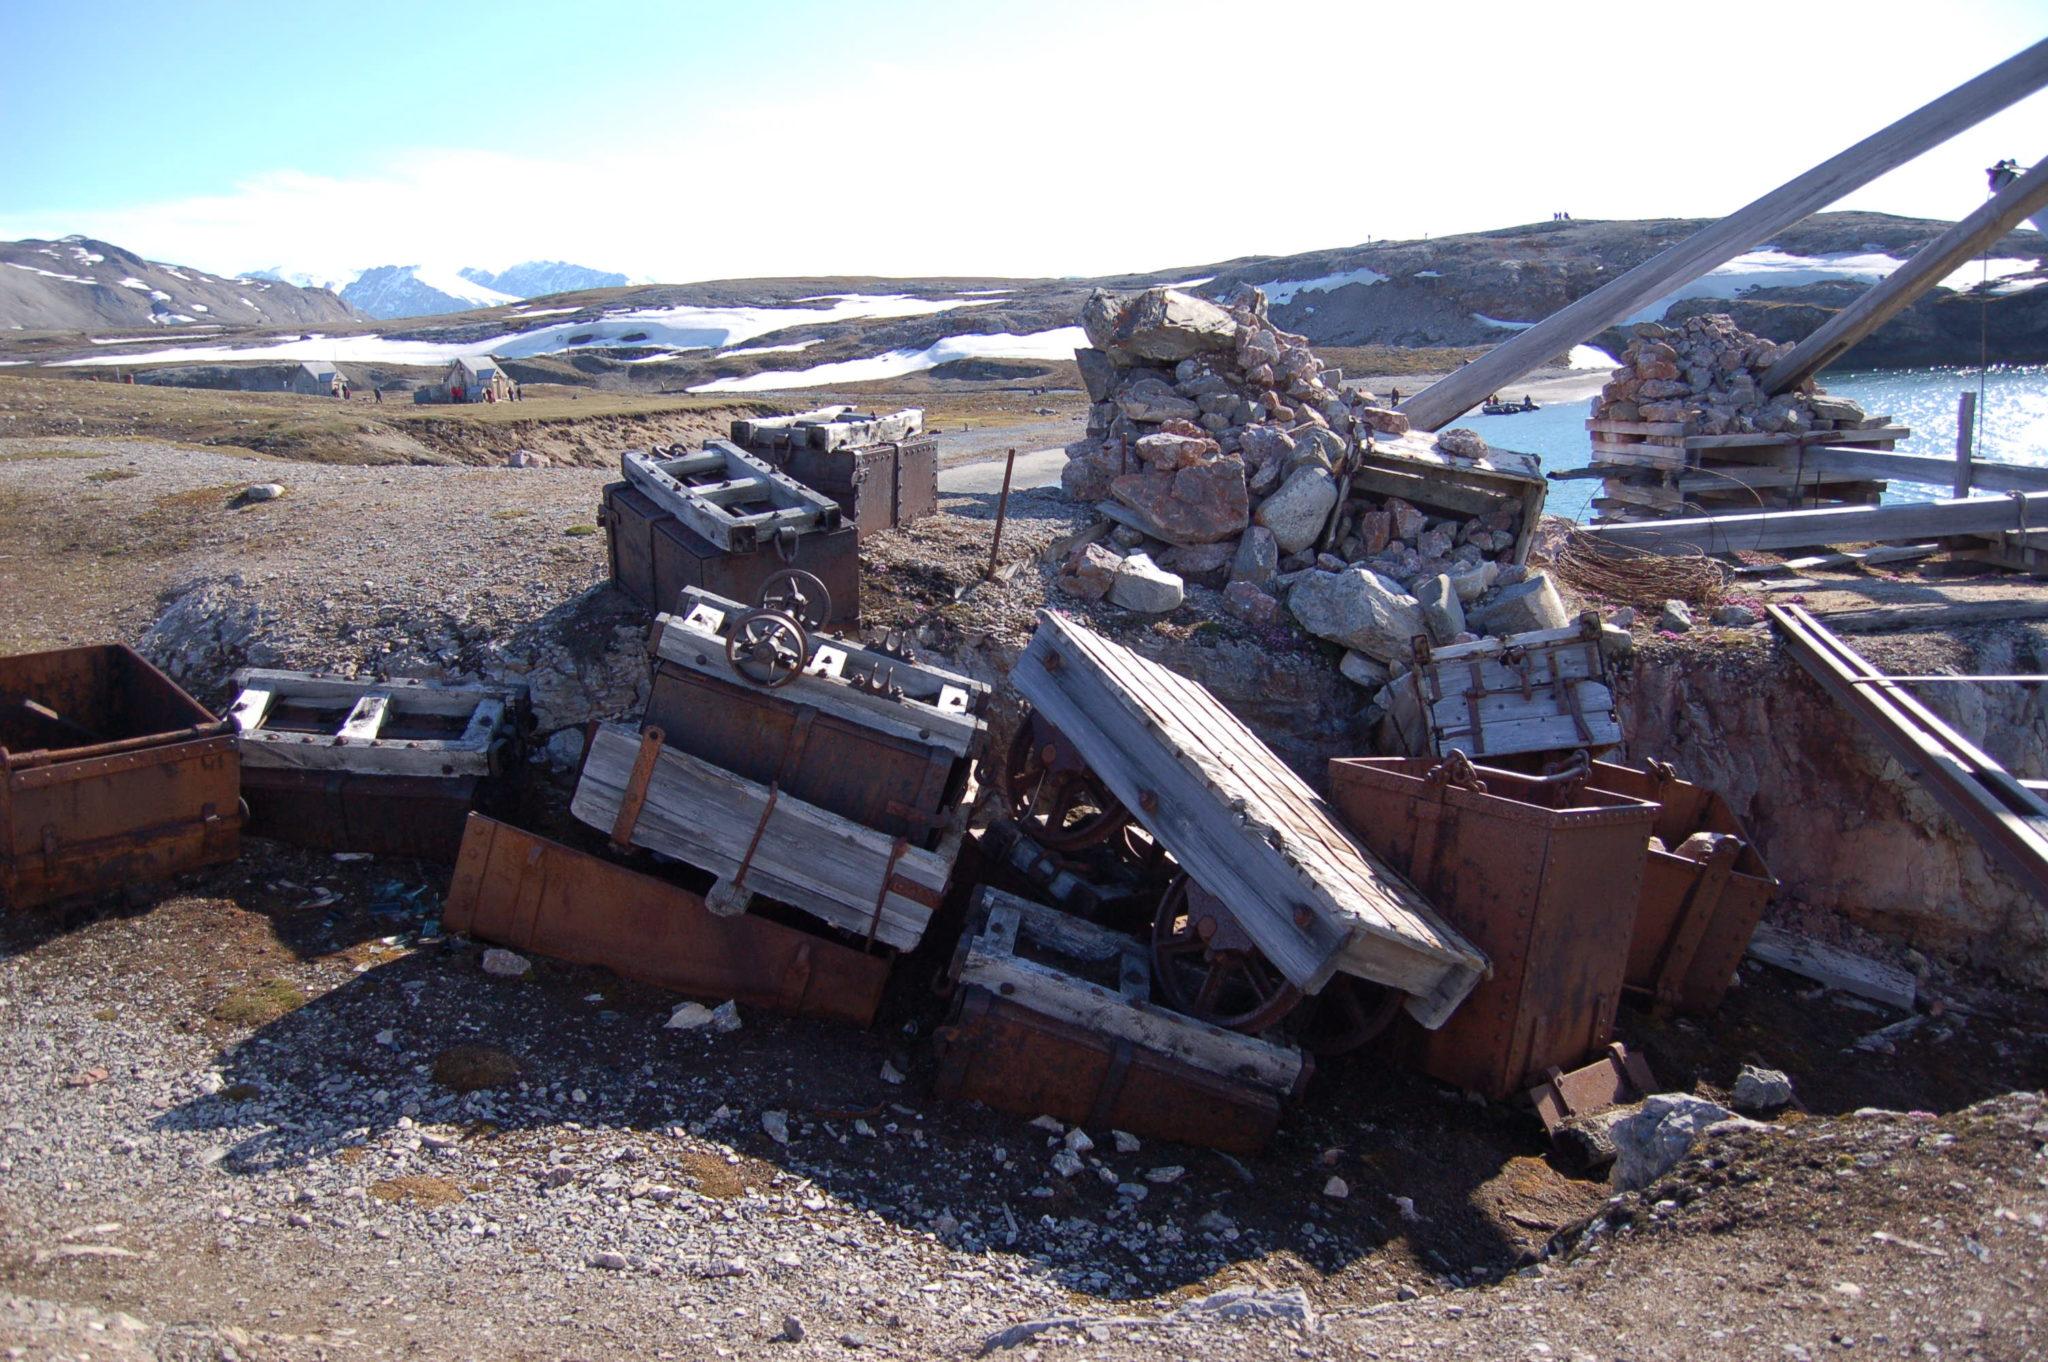 Derelict mining equipment, Svalbard